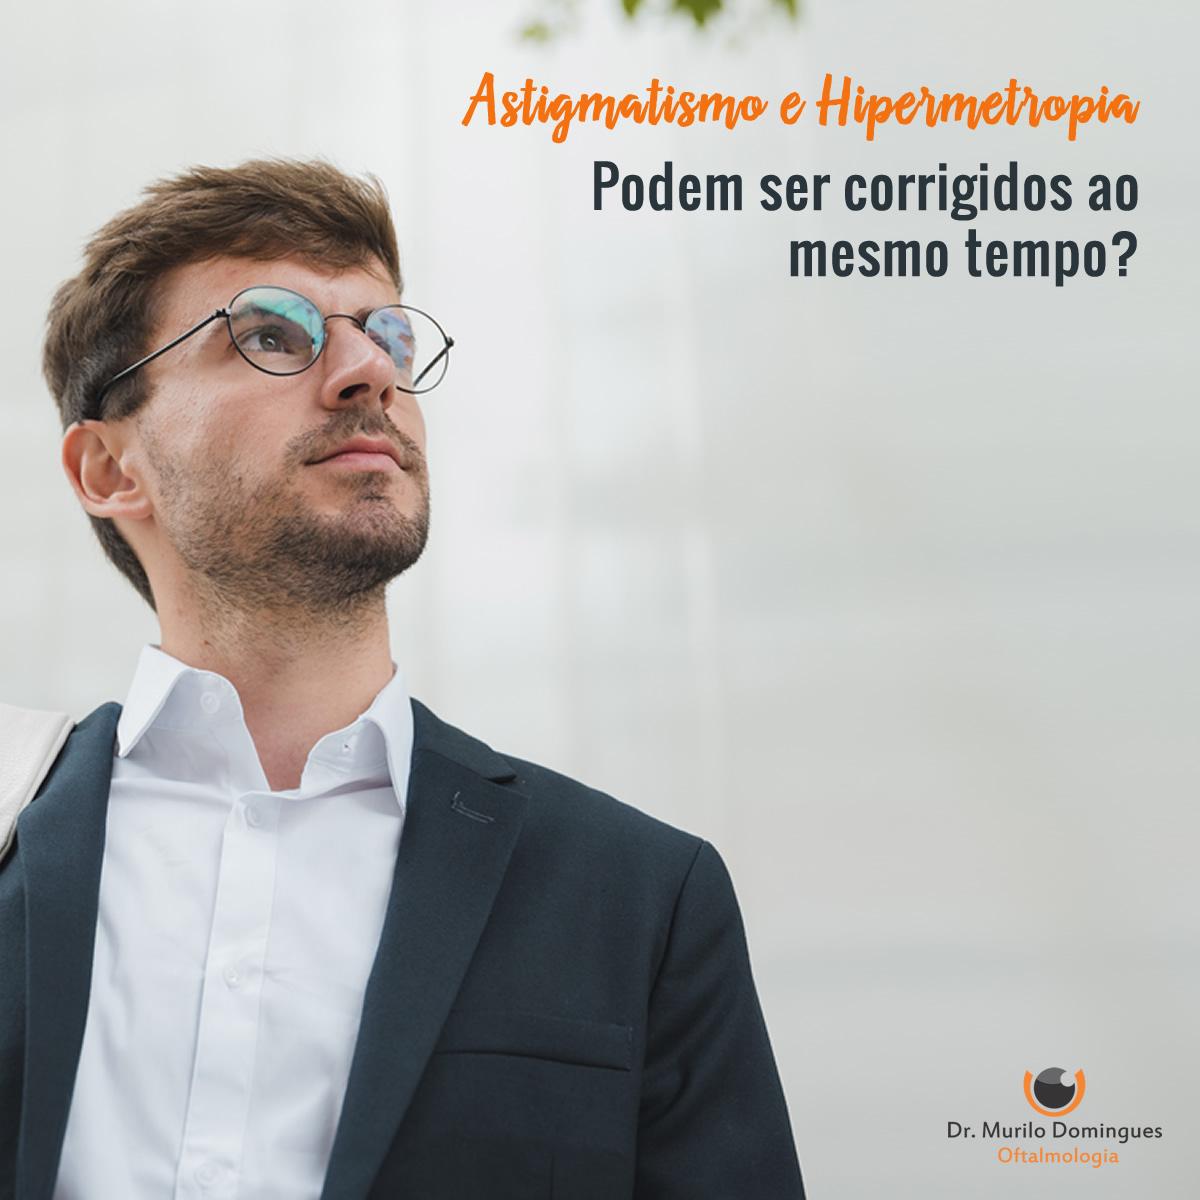 astigmatismo hipermetropia